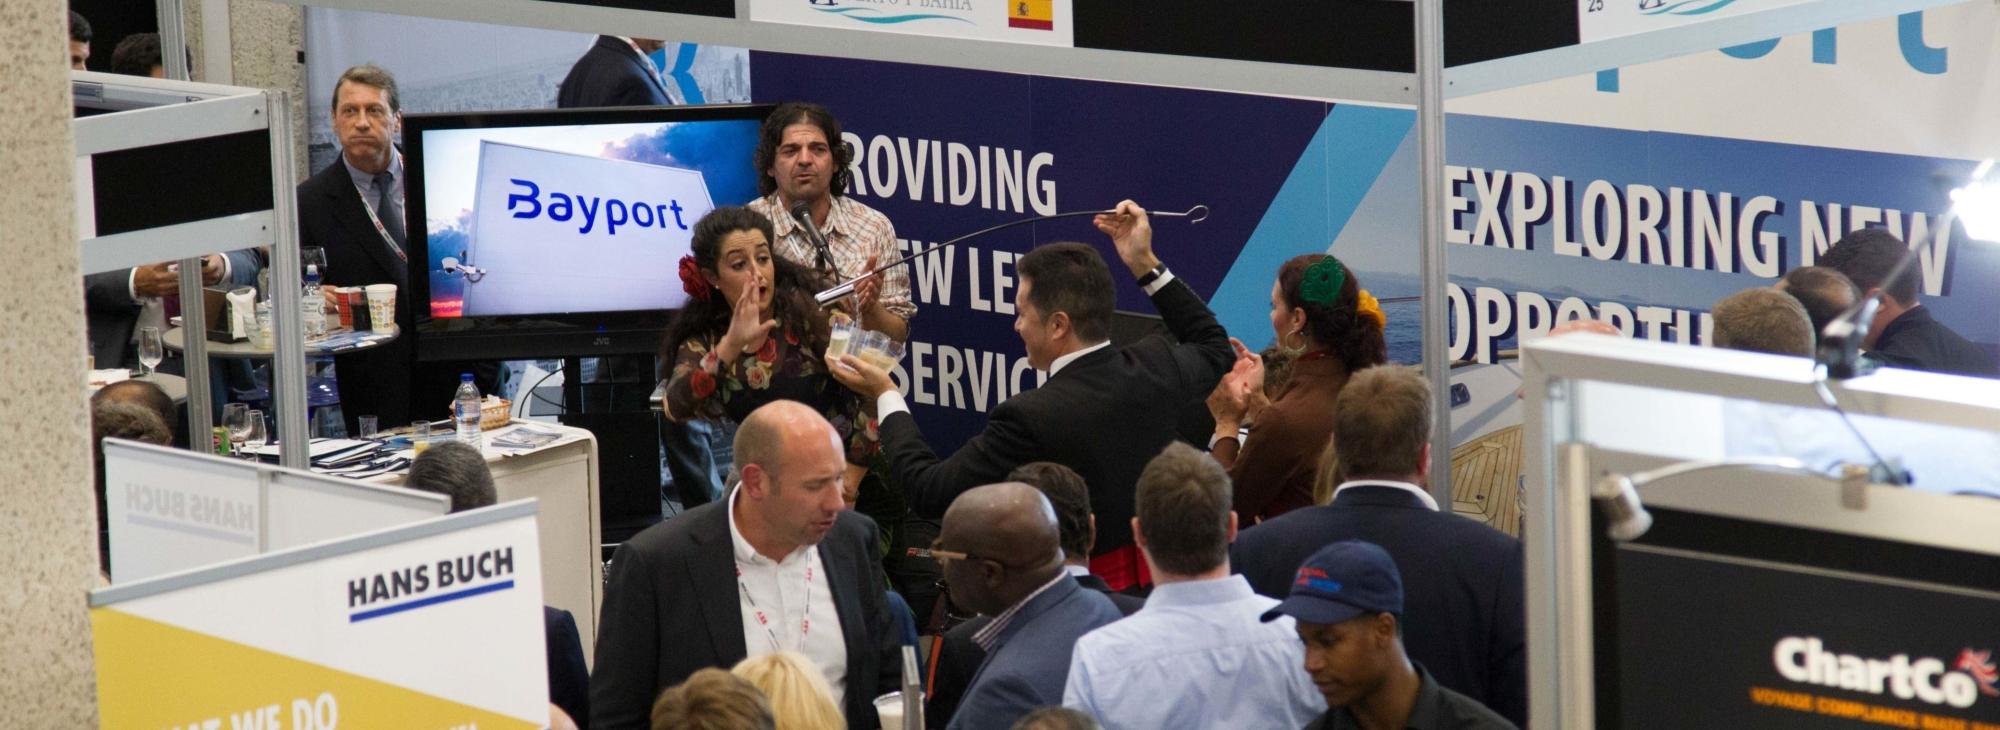 Exhibition   IMPA London 2019